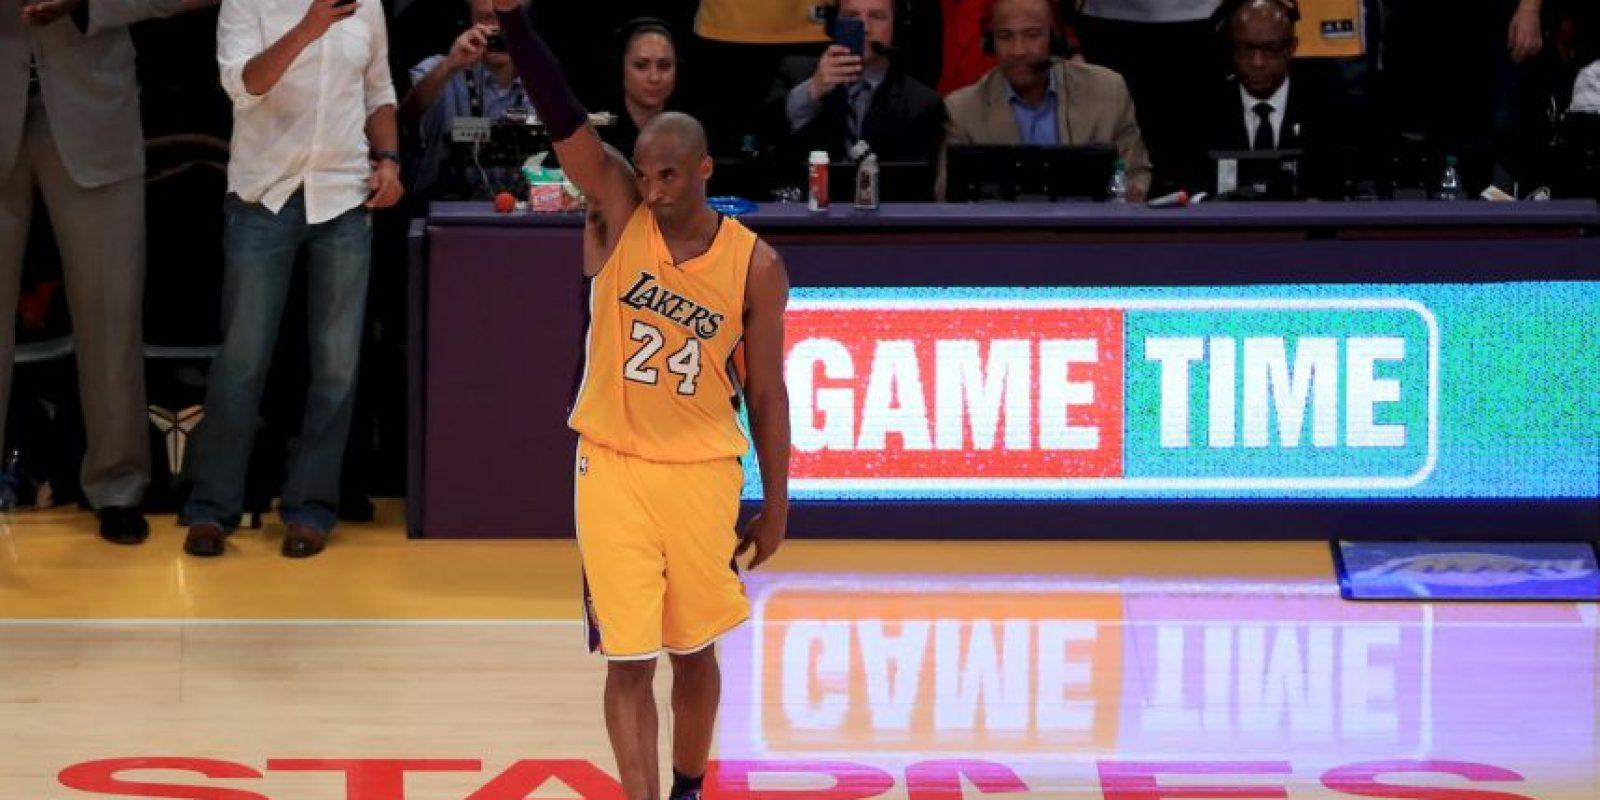 Kobe Bryant seguramente estará agradecido del tremendo regalo Foto:Getty Images